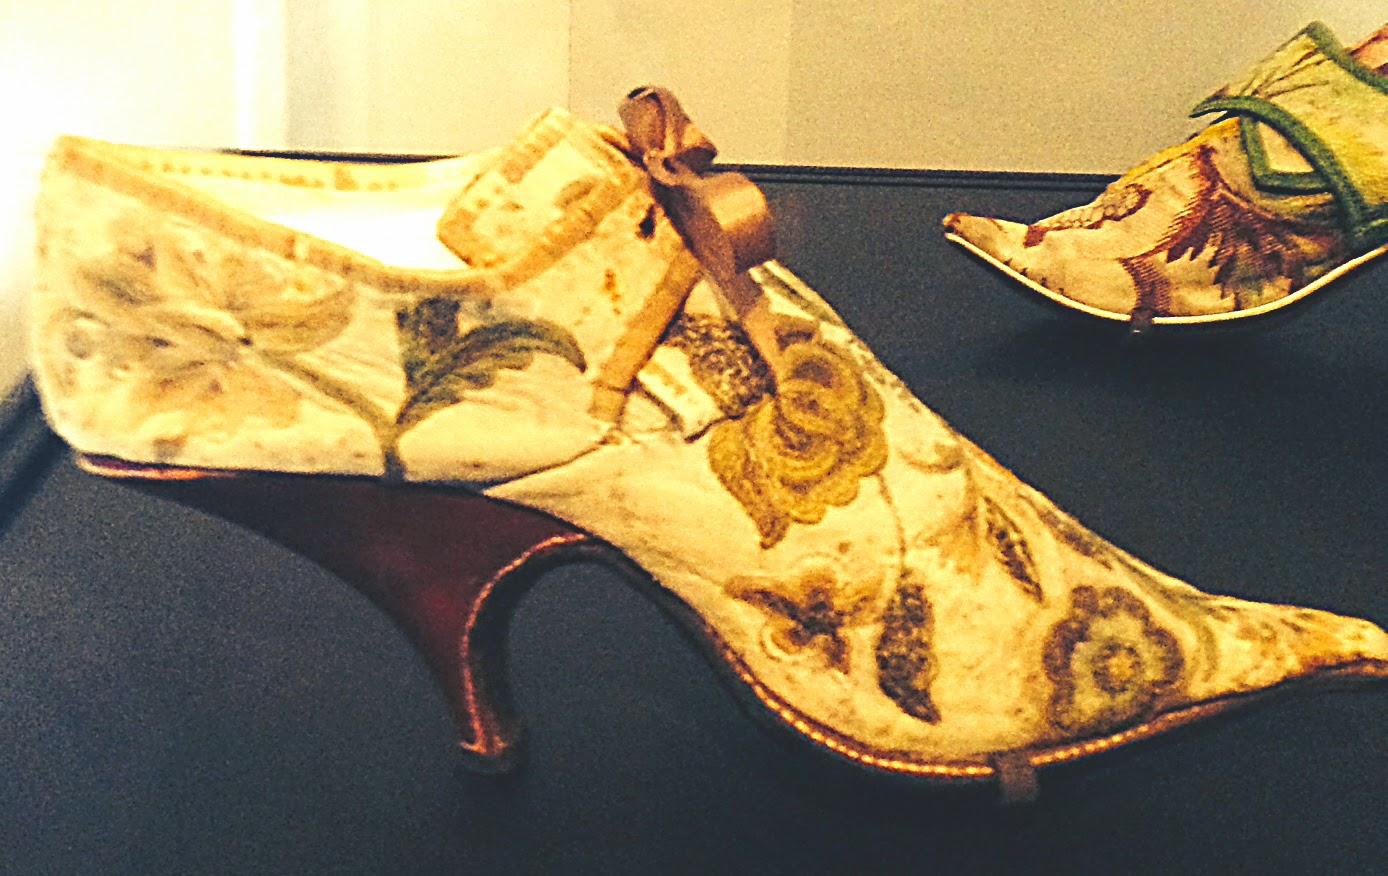 Idiosyncratic Fashionistas: KILLER HEELS: The Art of the High-Heeled ...